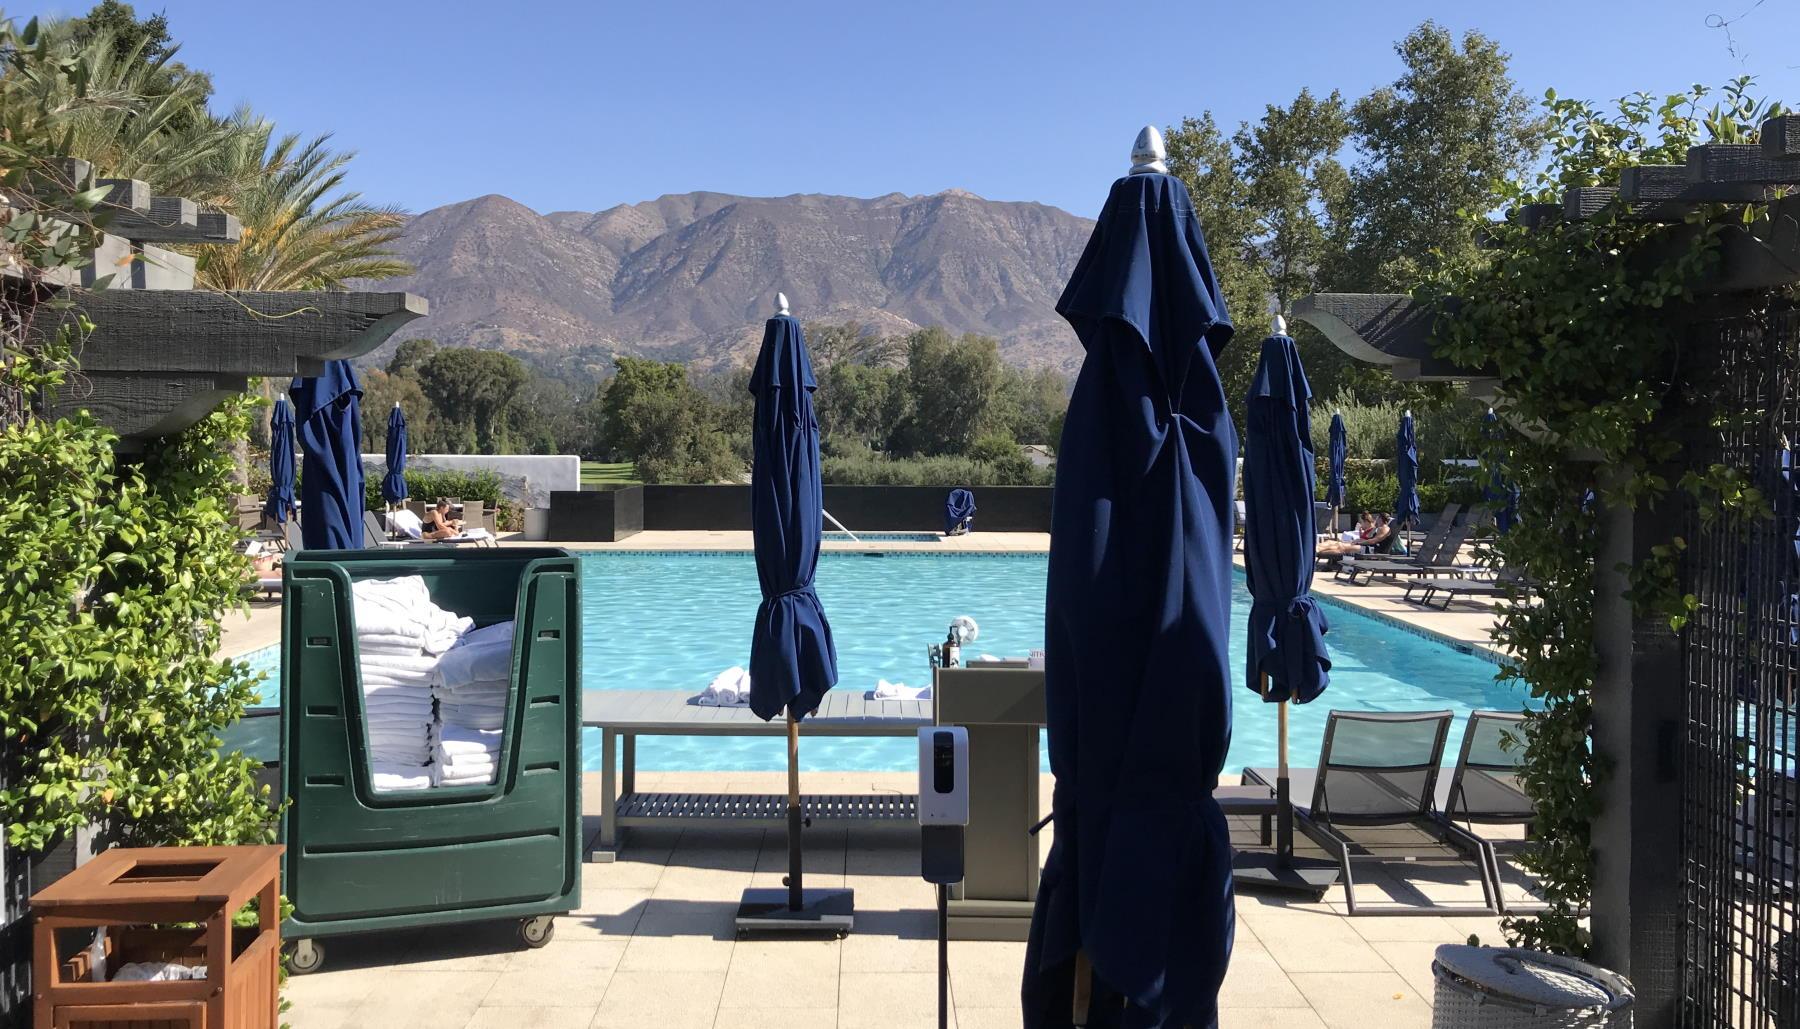 The Indigo Pool at the Ojai Valley Inn